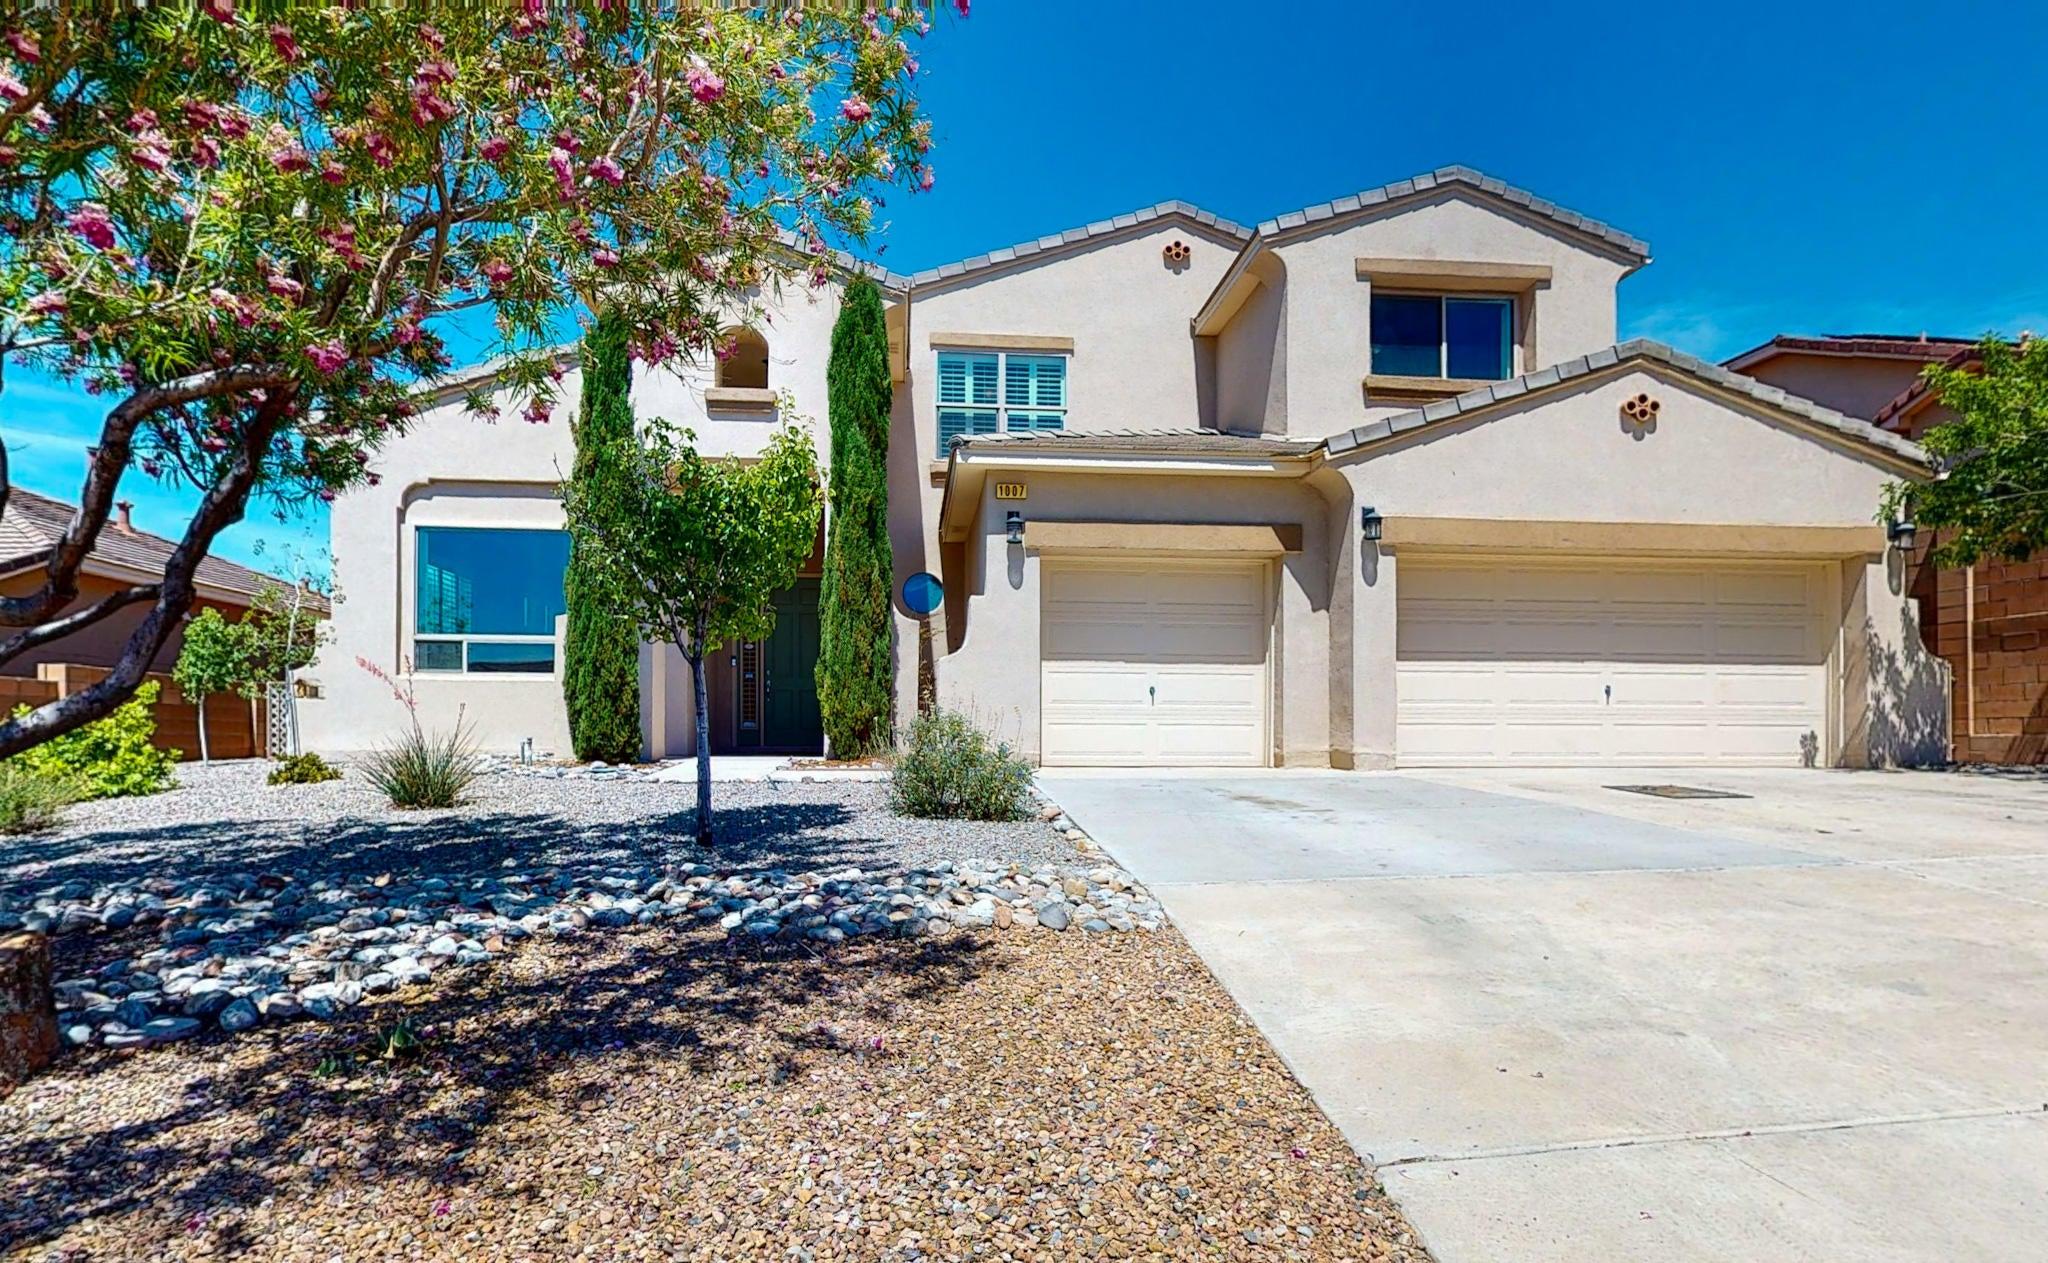 1007 DESERT BROOM Road NE, Rio Rancho, NM 87144